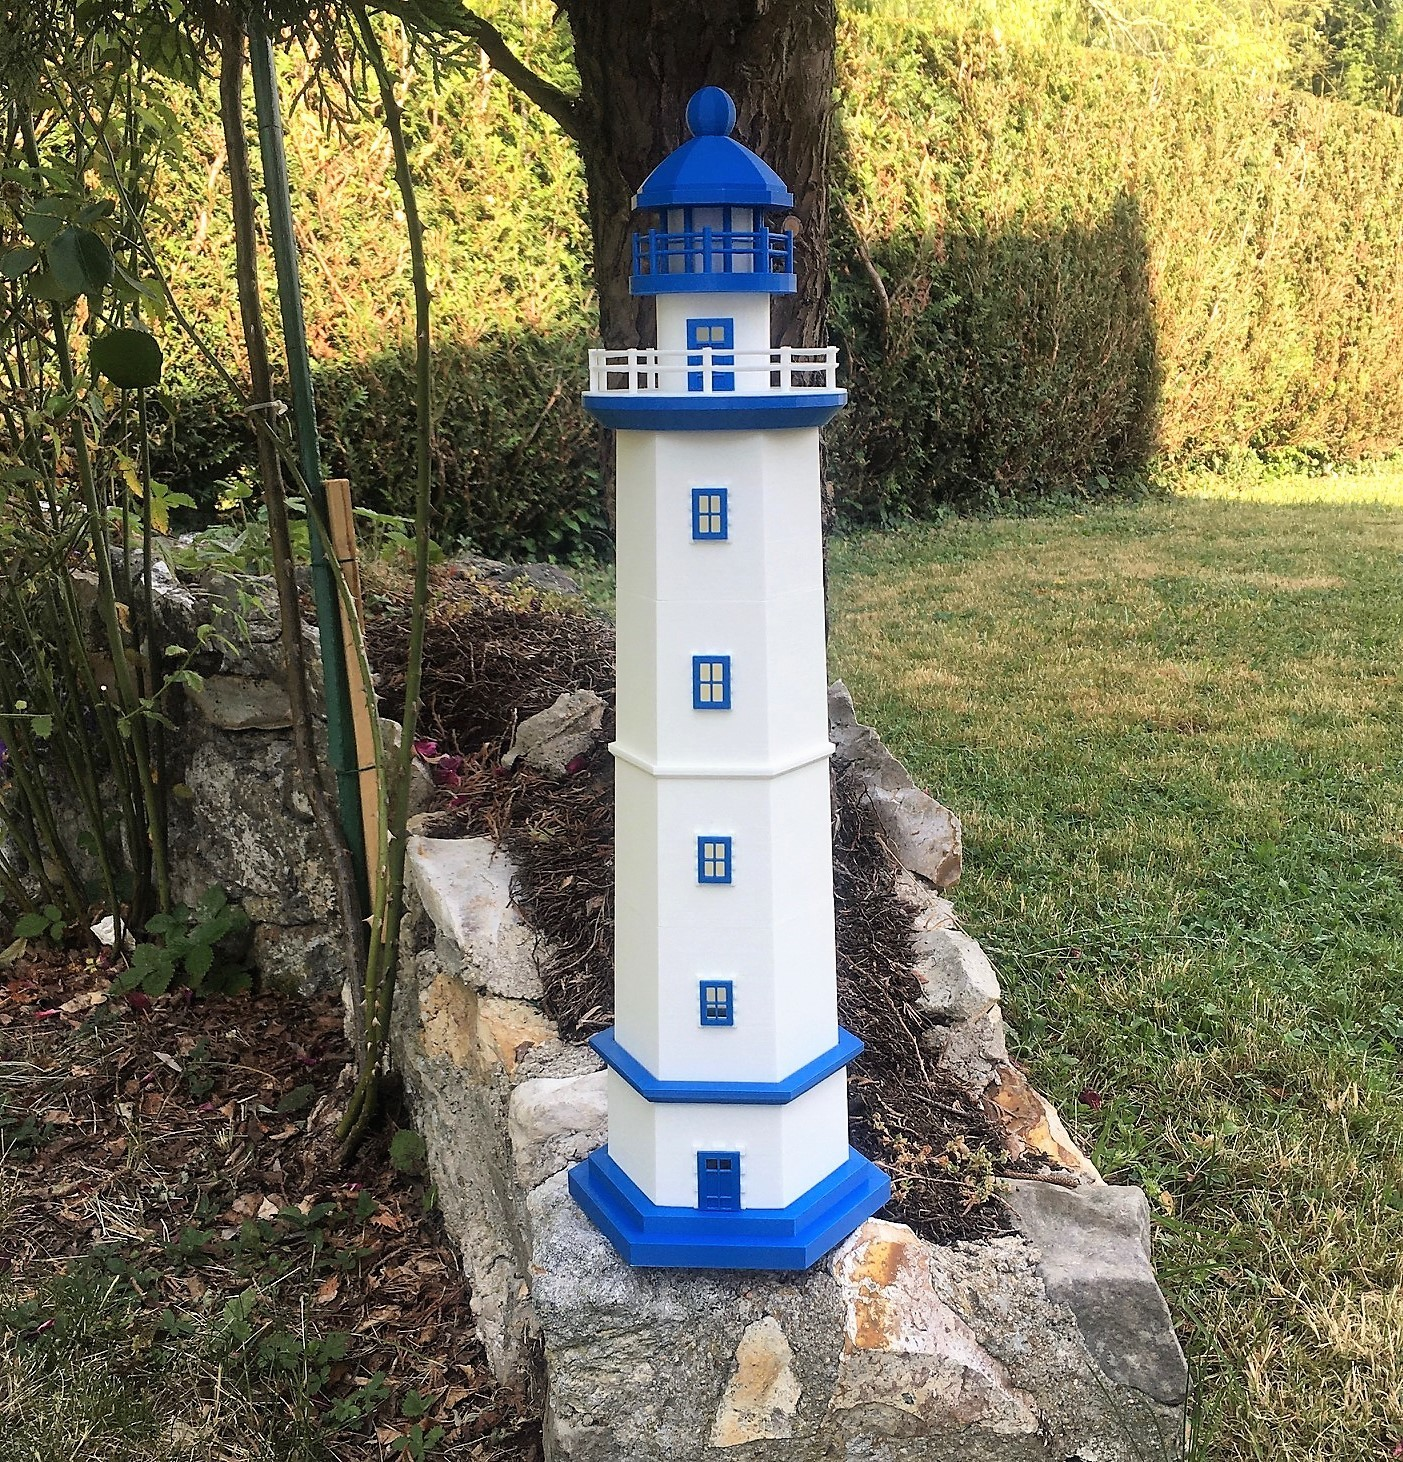 Phare.jpg Download free STL file Lighthouse • 3D printing template, jteix